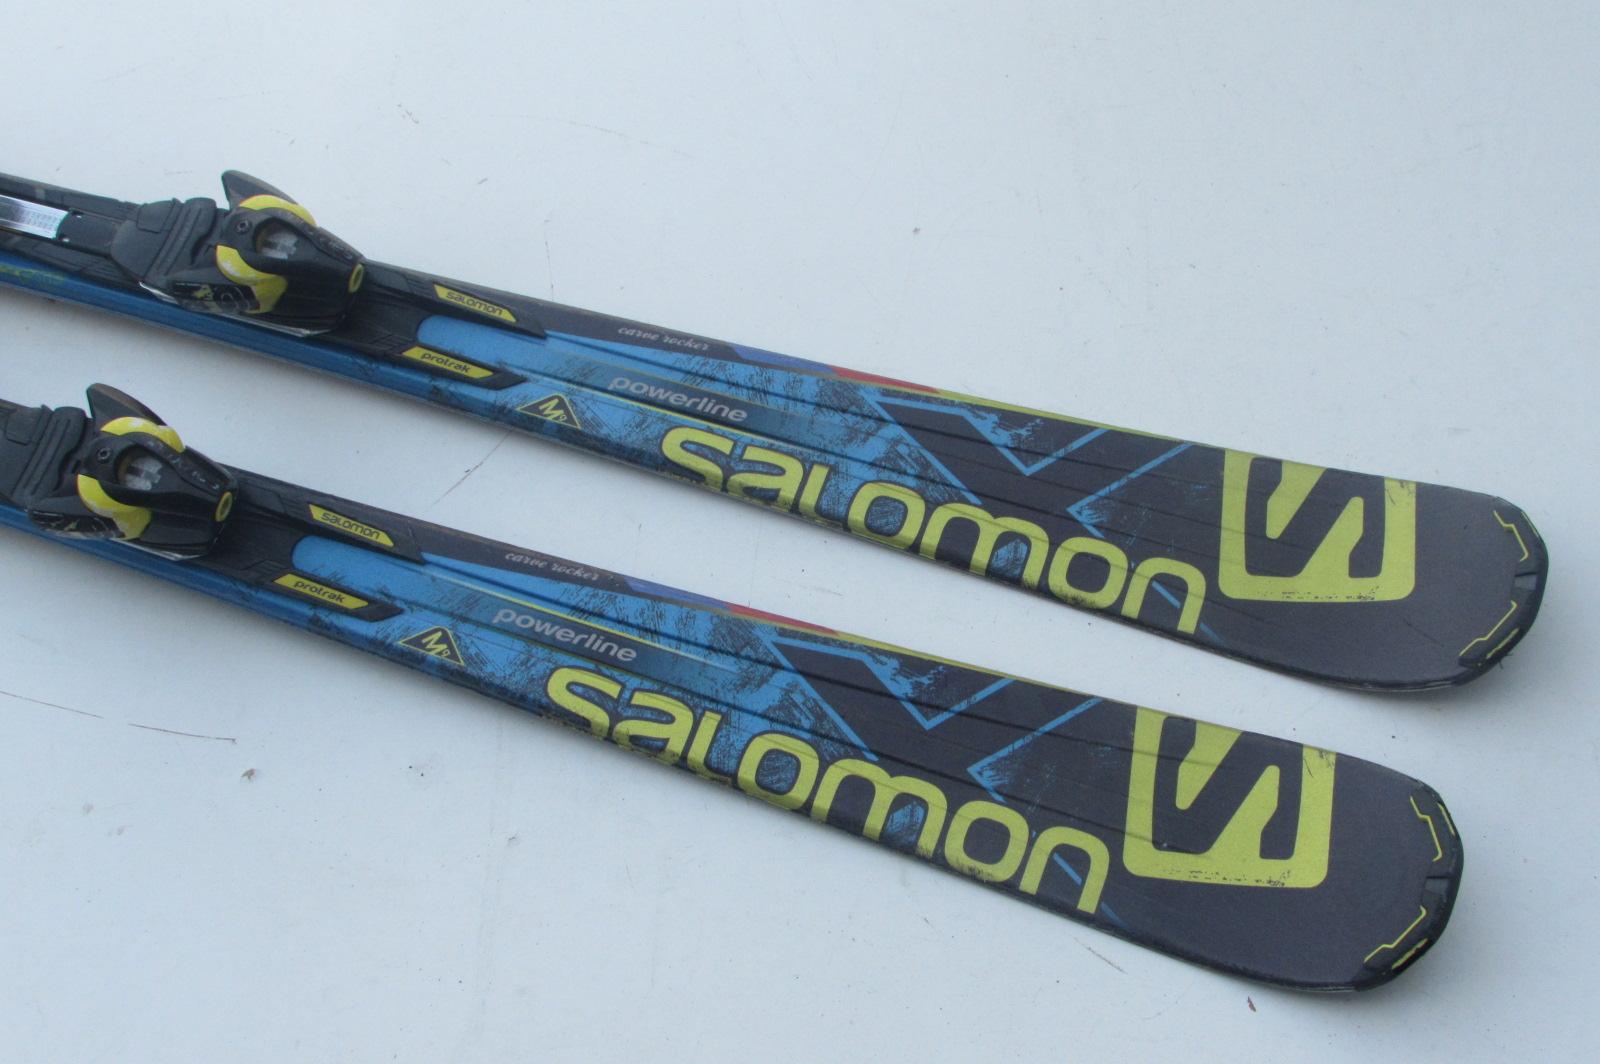 Narty SALOMON X KART carve rocker 162 cm (nr18) 7284282097